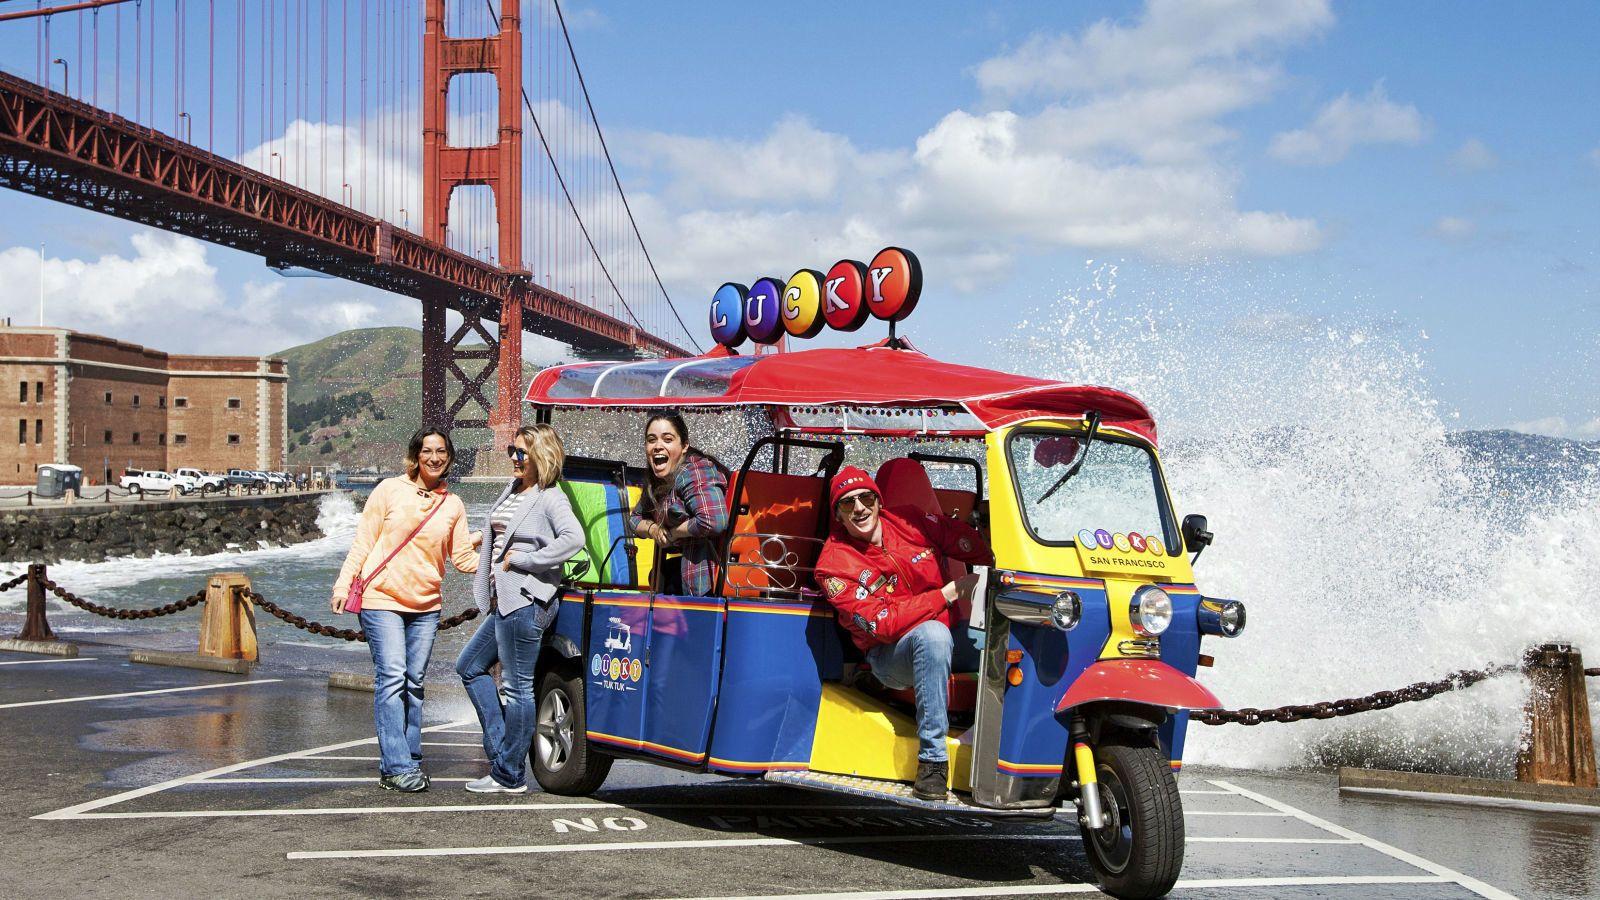 Ultimate Lucky Tuk Tuk San Francisco City Tour - 2.5 hours